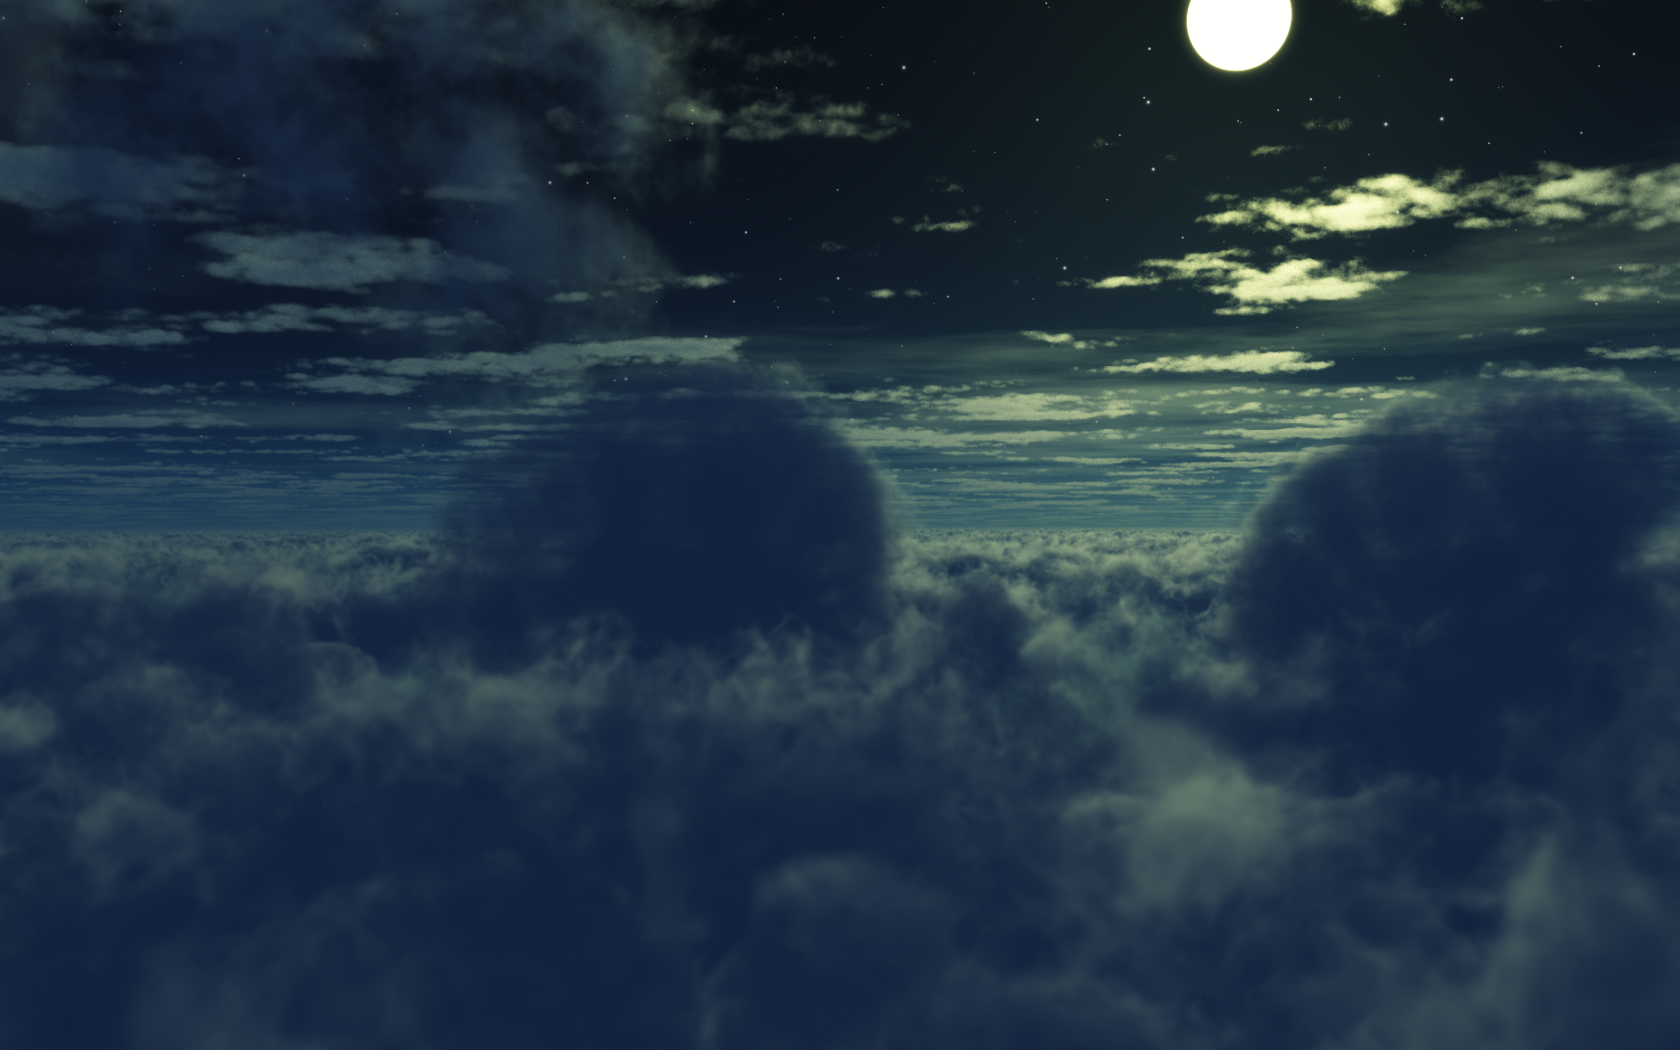 ws_Sky_dream_1680x1050-1.jpg